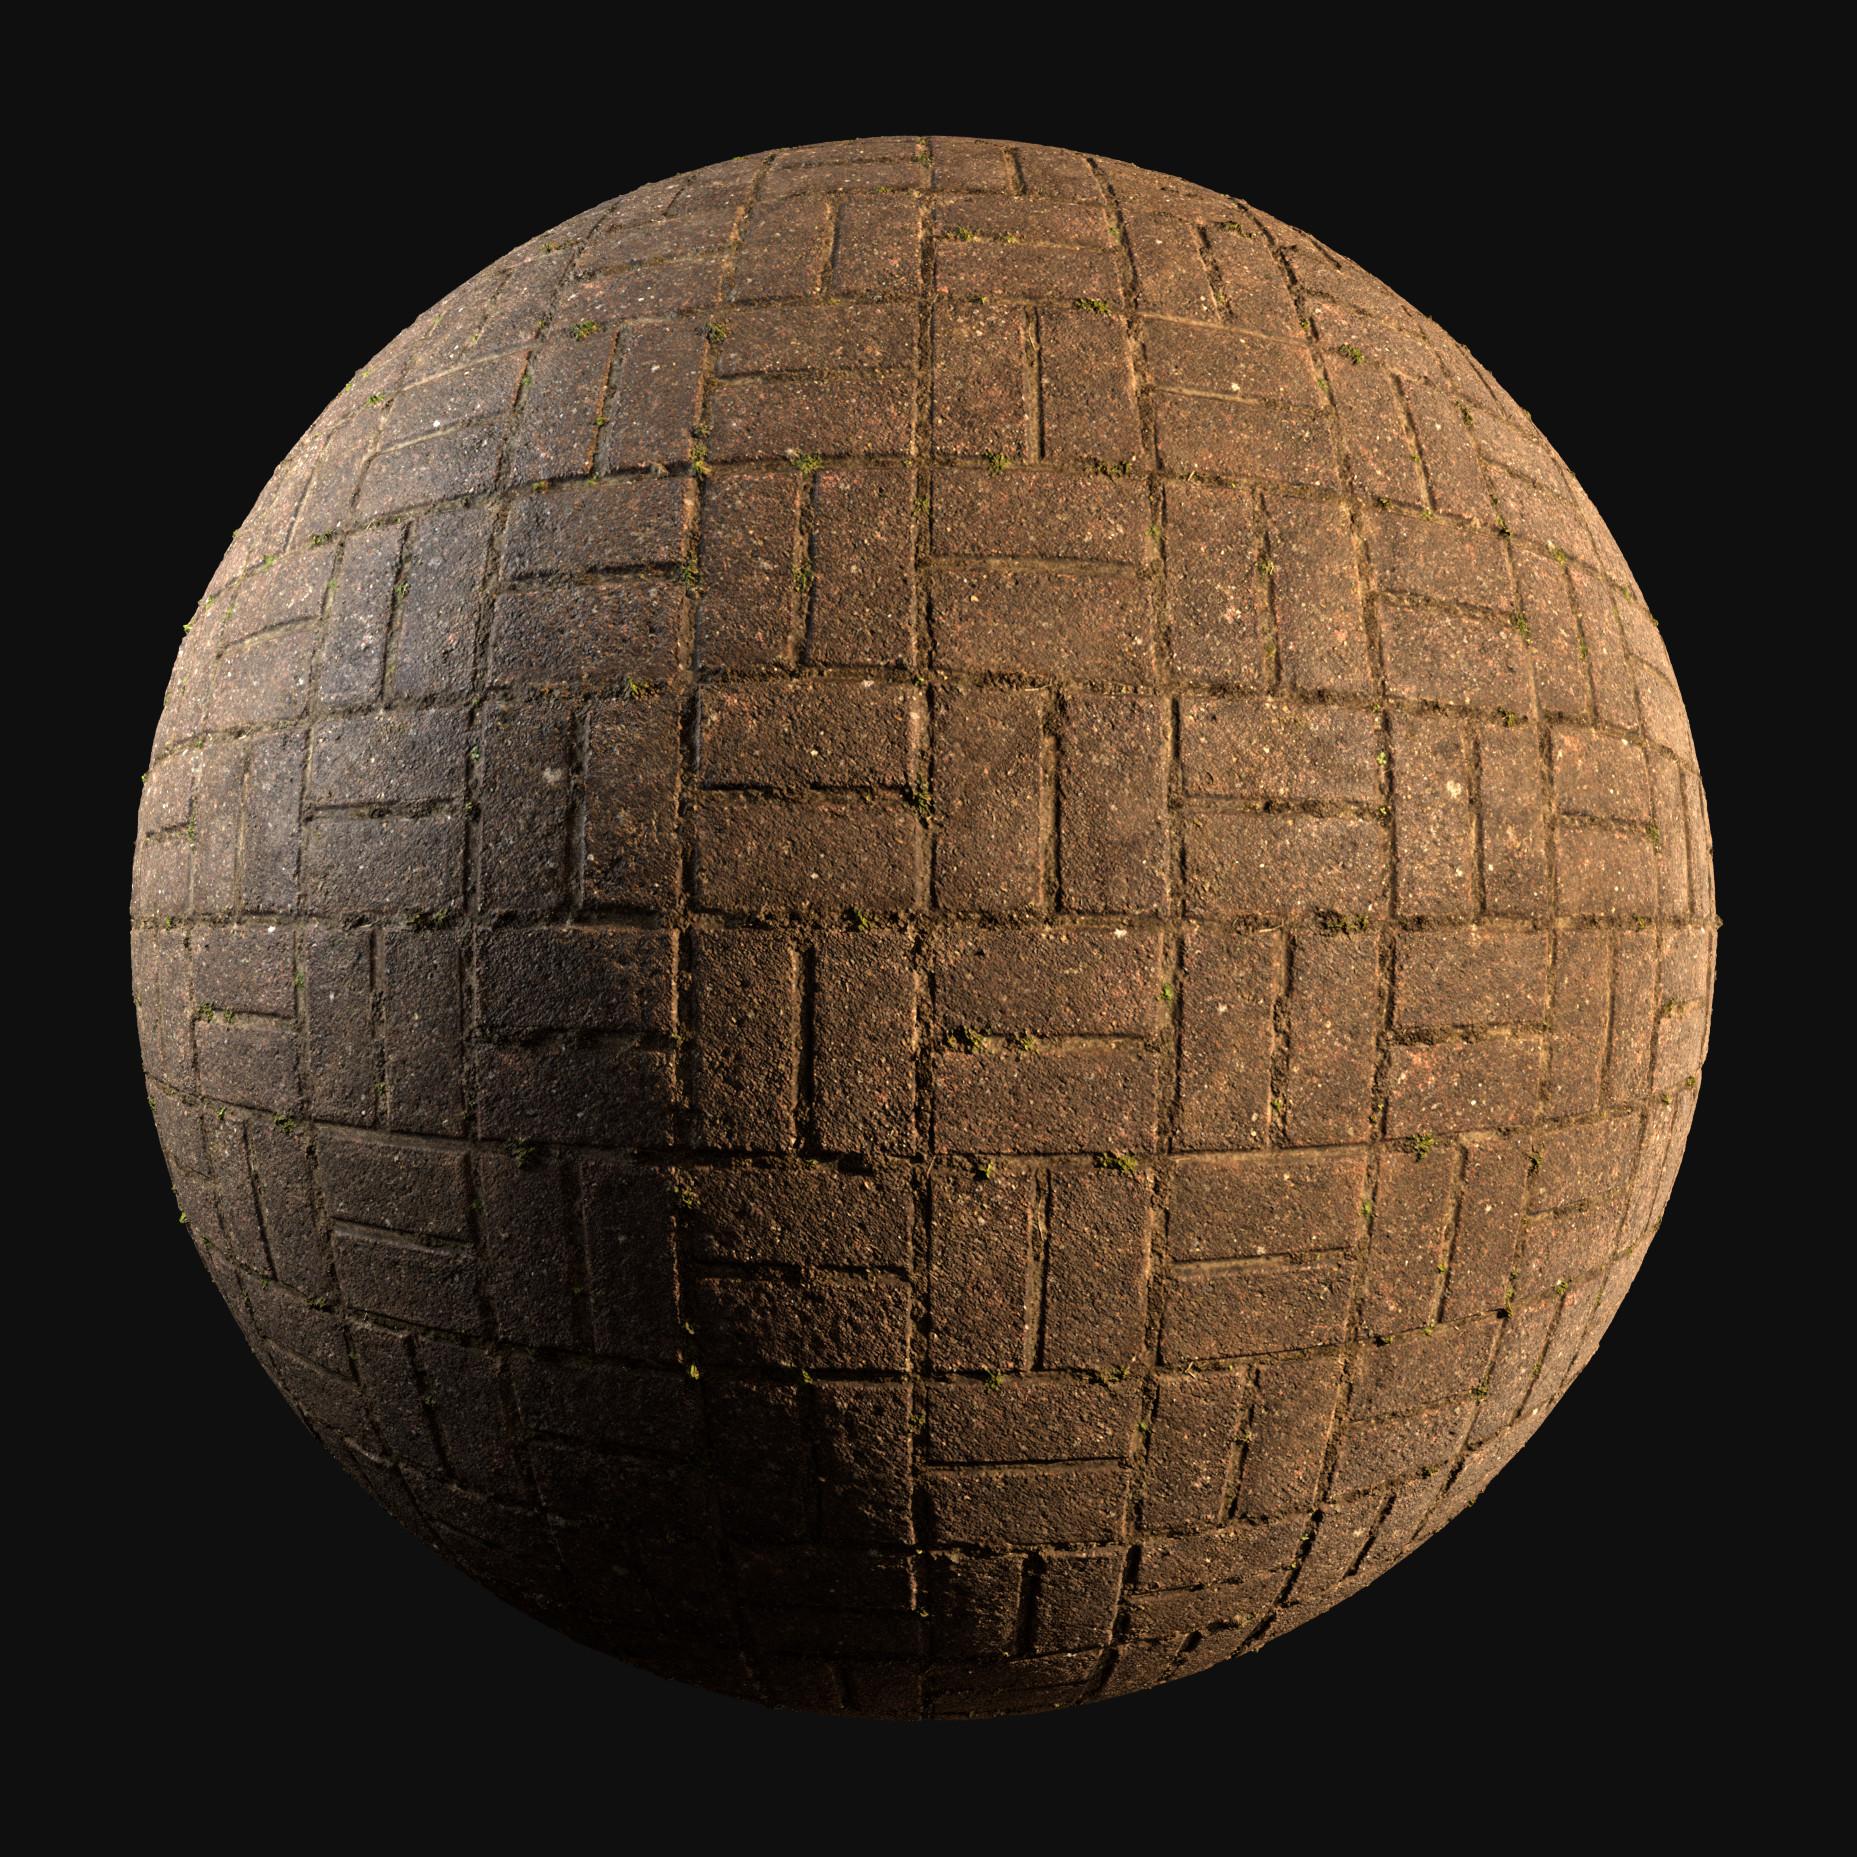 Shariq altaf pavestone spherestill 01 2